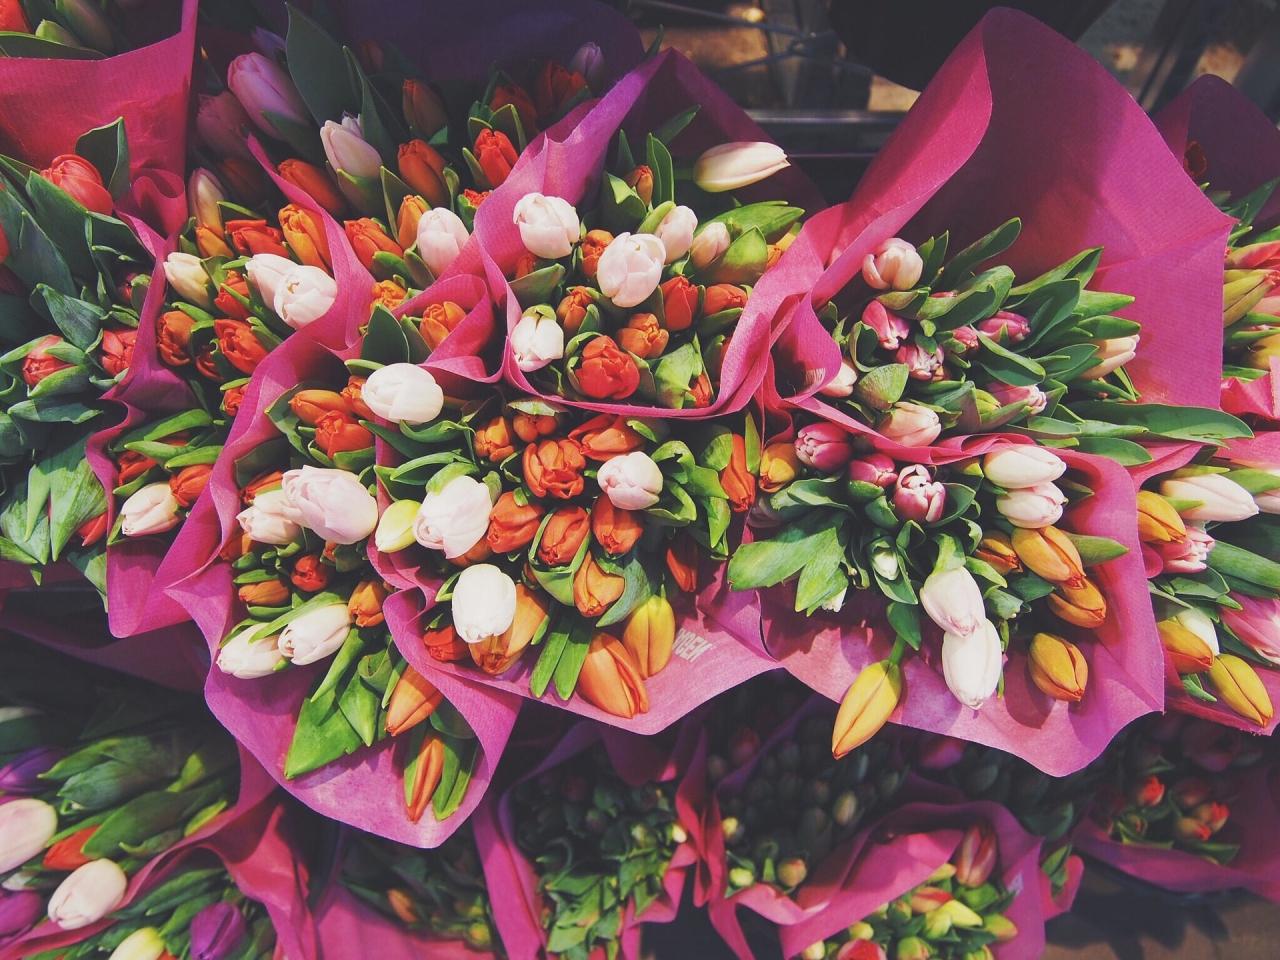 ÁE Virágkötő és Virágkereskedő tanfolyam gyakorlattal